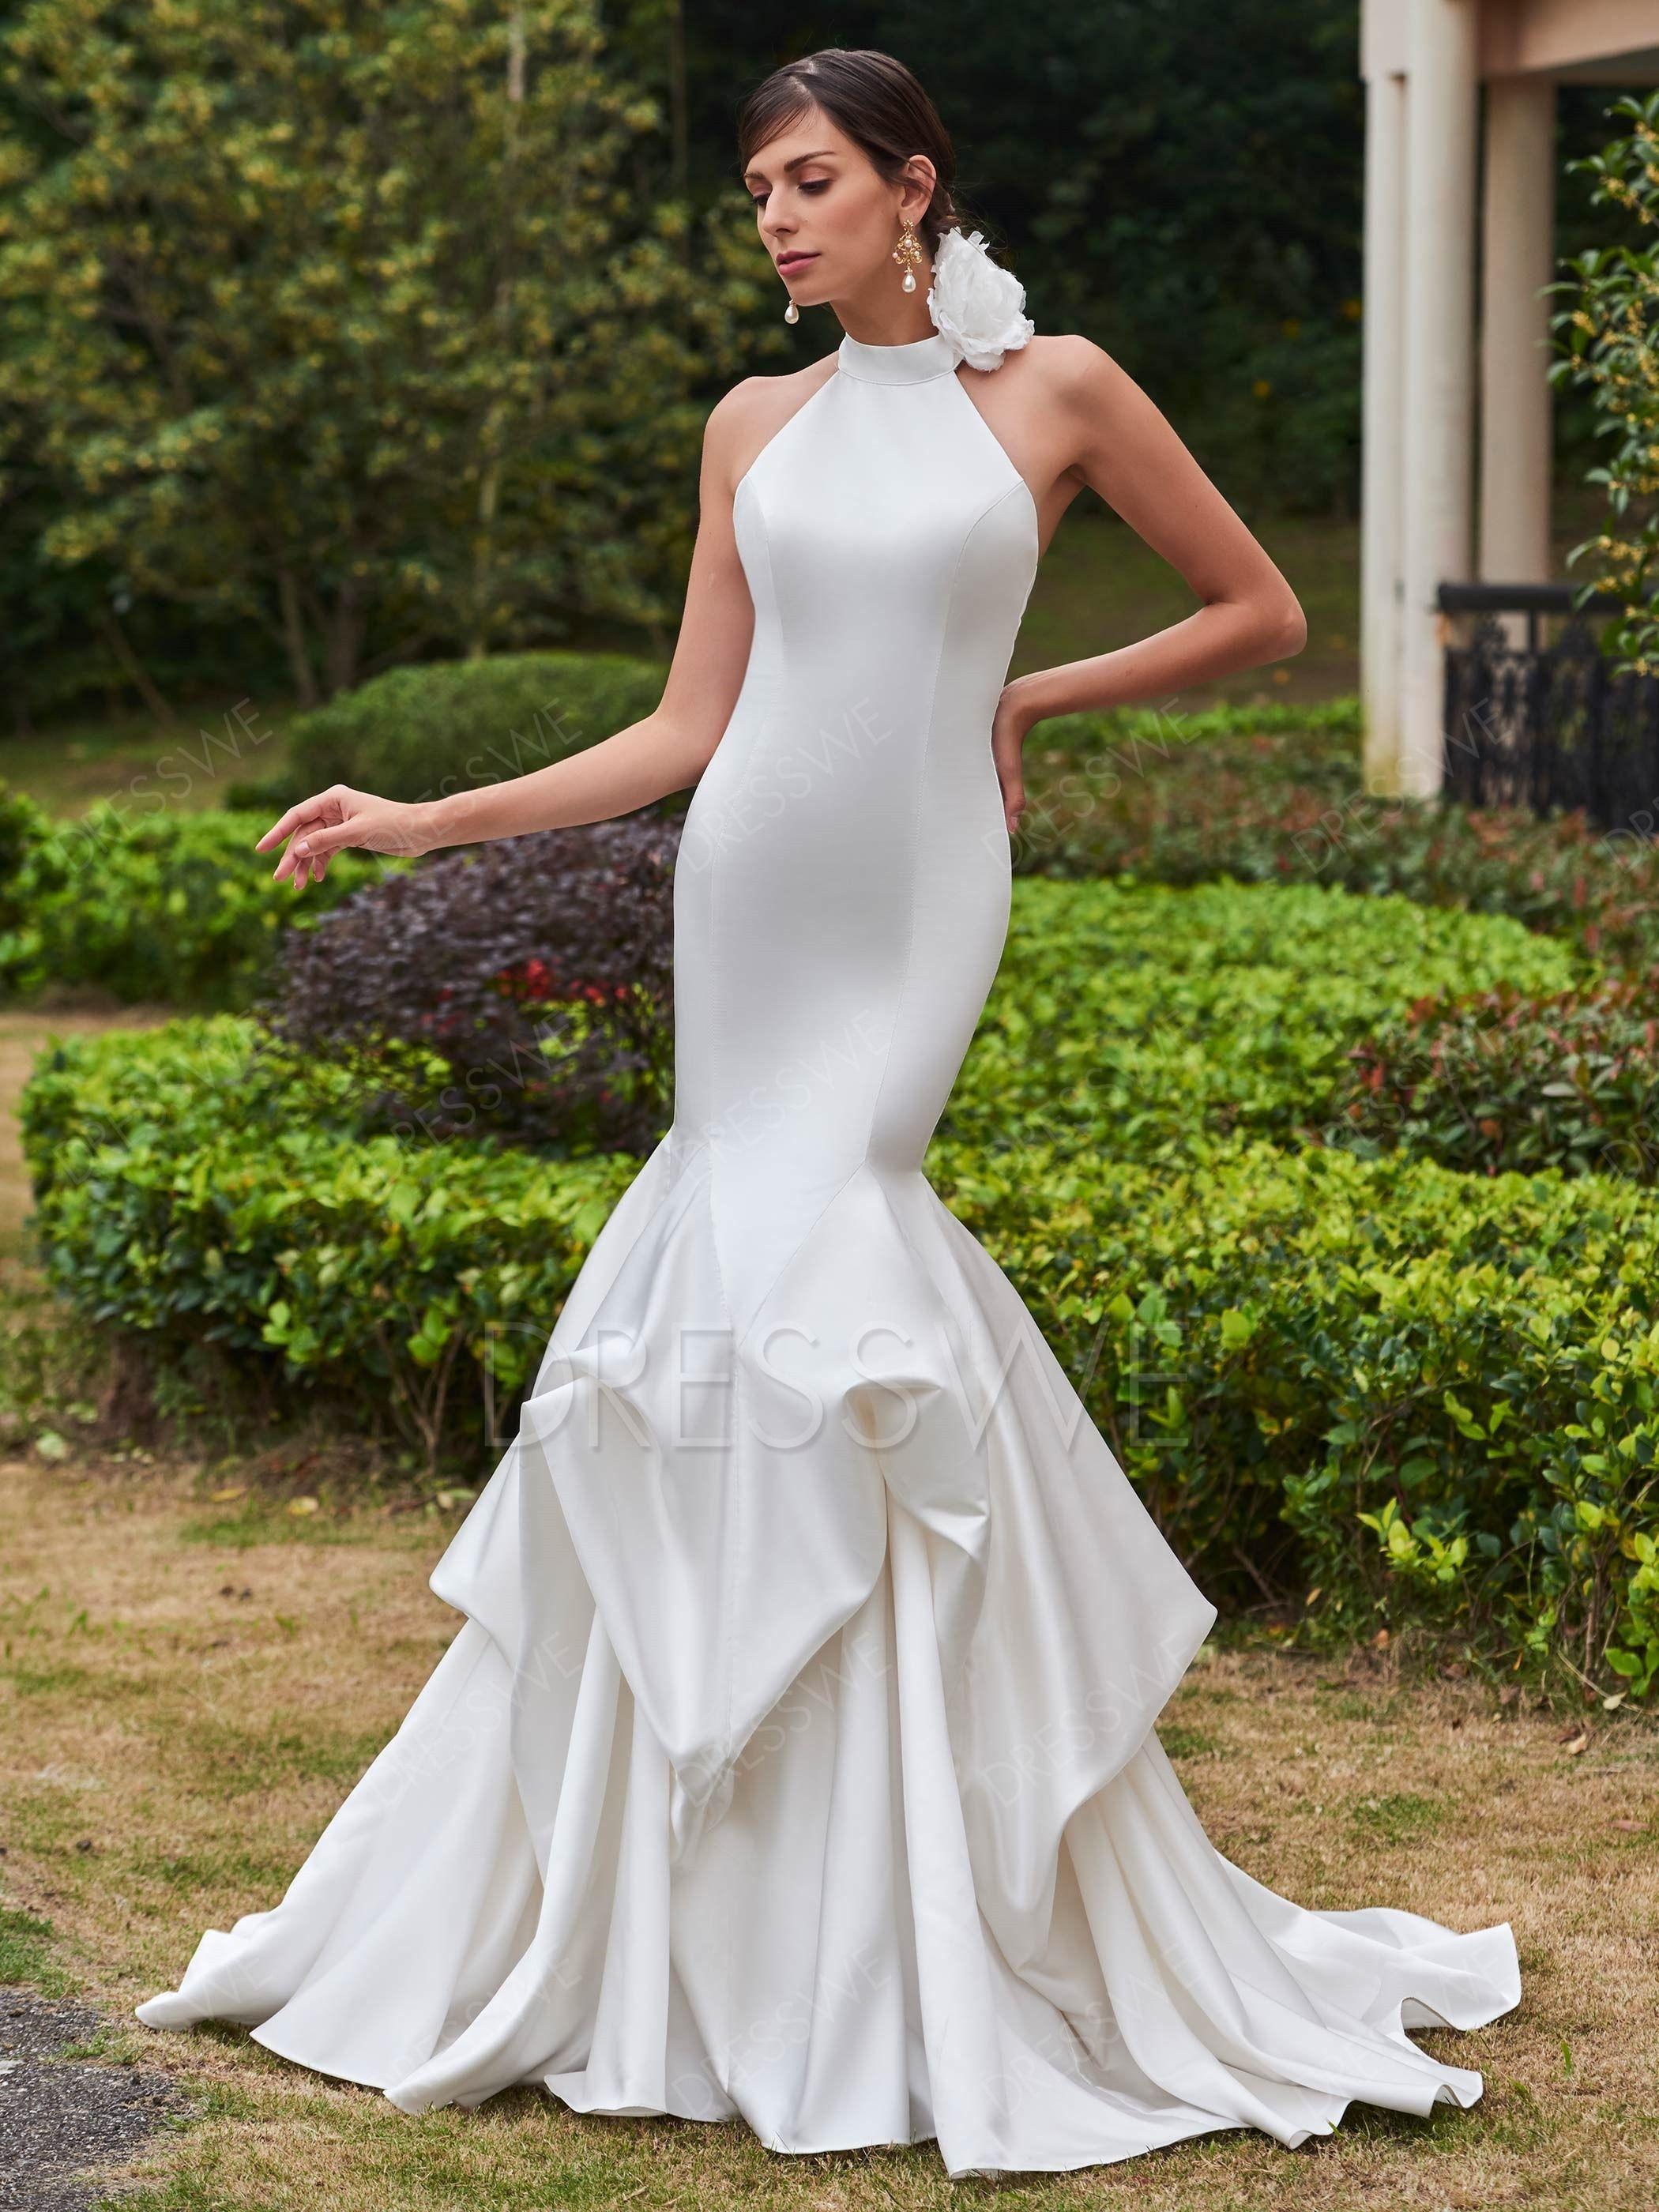 Buy Vintage High Neck Zipper Up Mermaid Wedding Dress Online Dresswe Com Offer High Qua Top Wedding Dresses Satin Mermaid Wedding Dress Mermaid Wedding Dress [ 2800 x 2100 Pixel ]